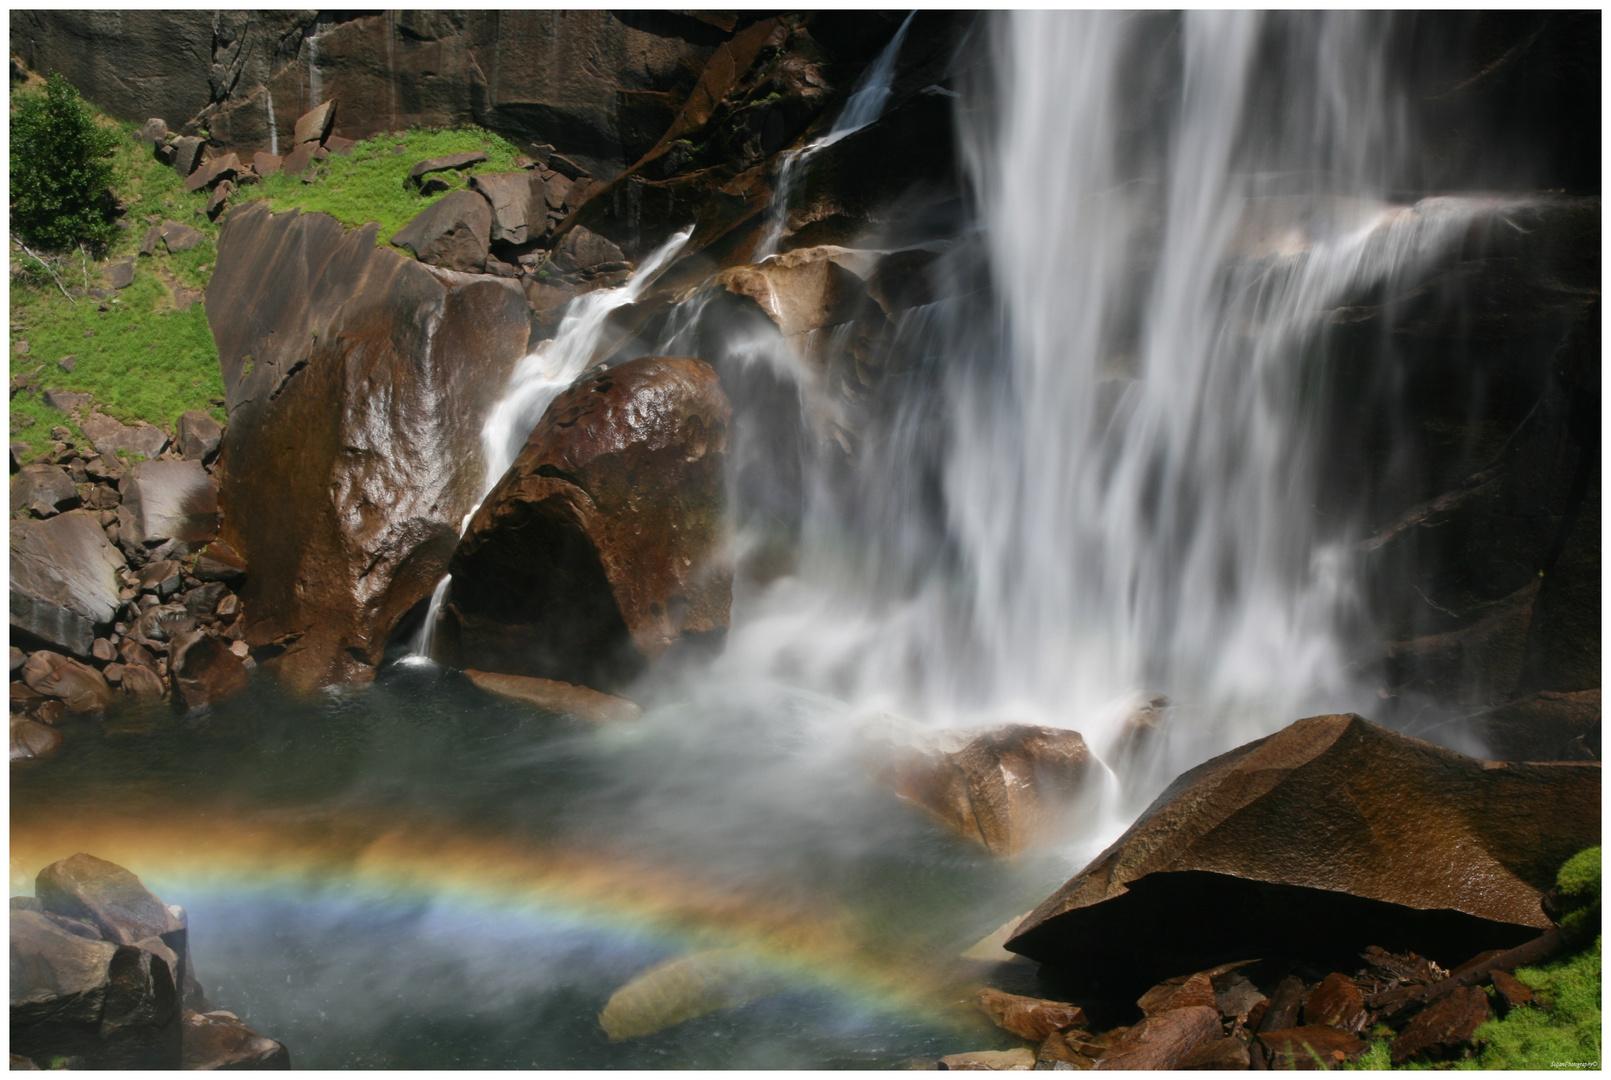 Yosemite National Park - Am Fuß des Vernal Fall